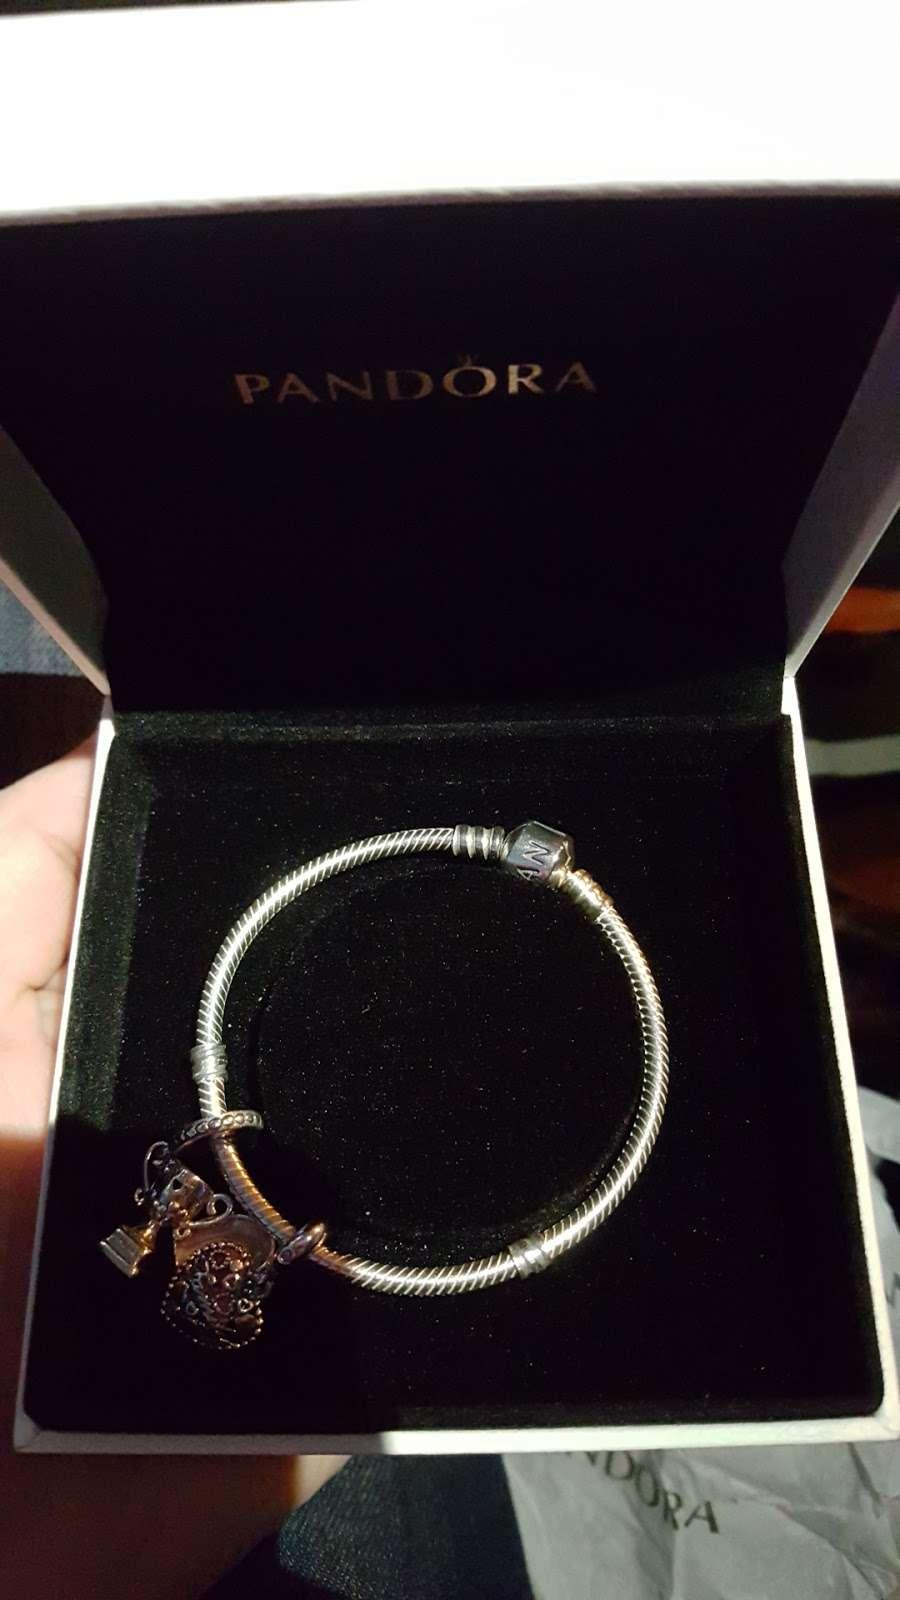 PANDORA Jewelry - jewelry store    Photo 9 of 9   Address: 1107 Green Acres Rd S #103, Valley Stream, NY 11581, USA   Phone: (516) 654-6440